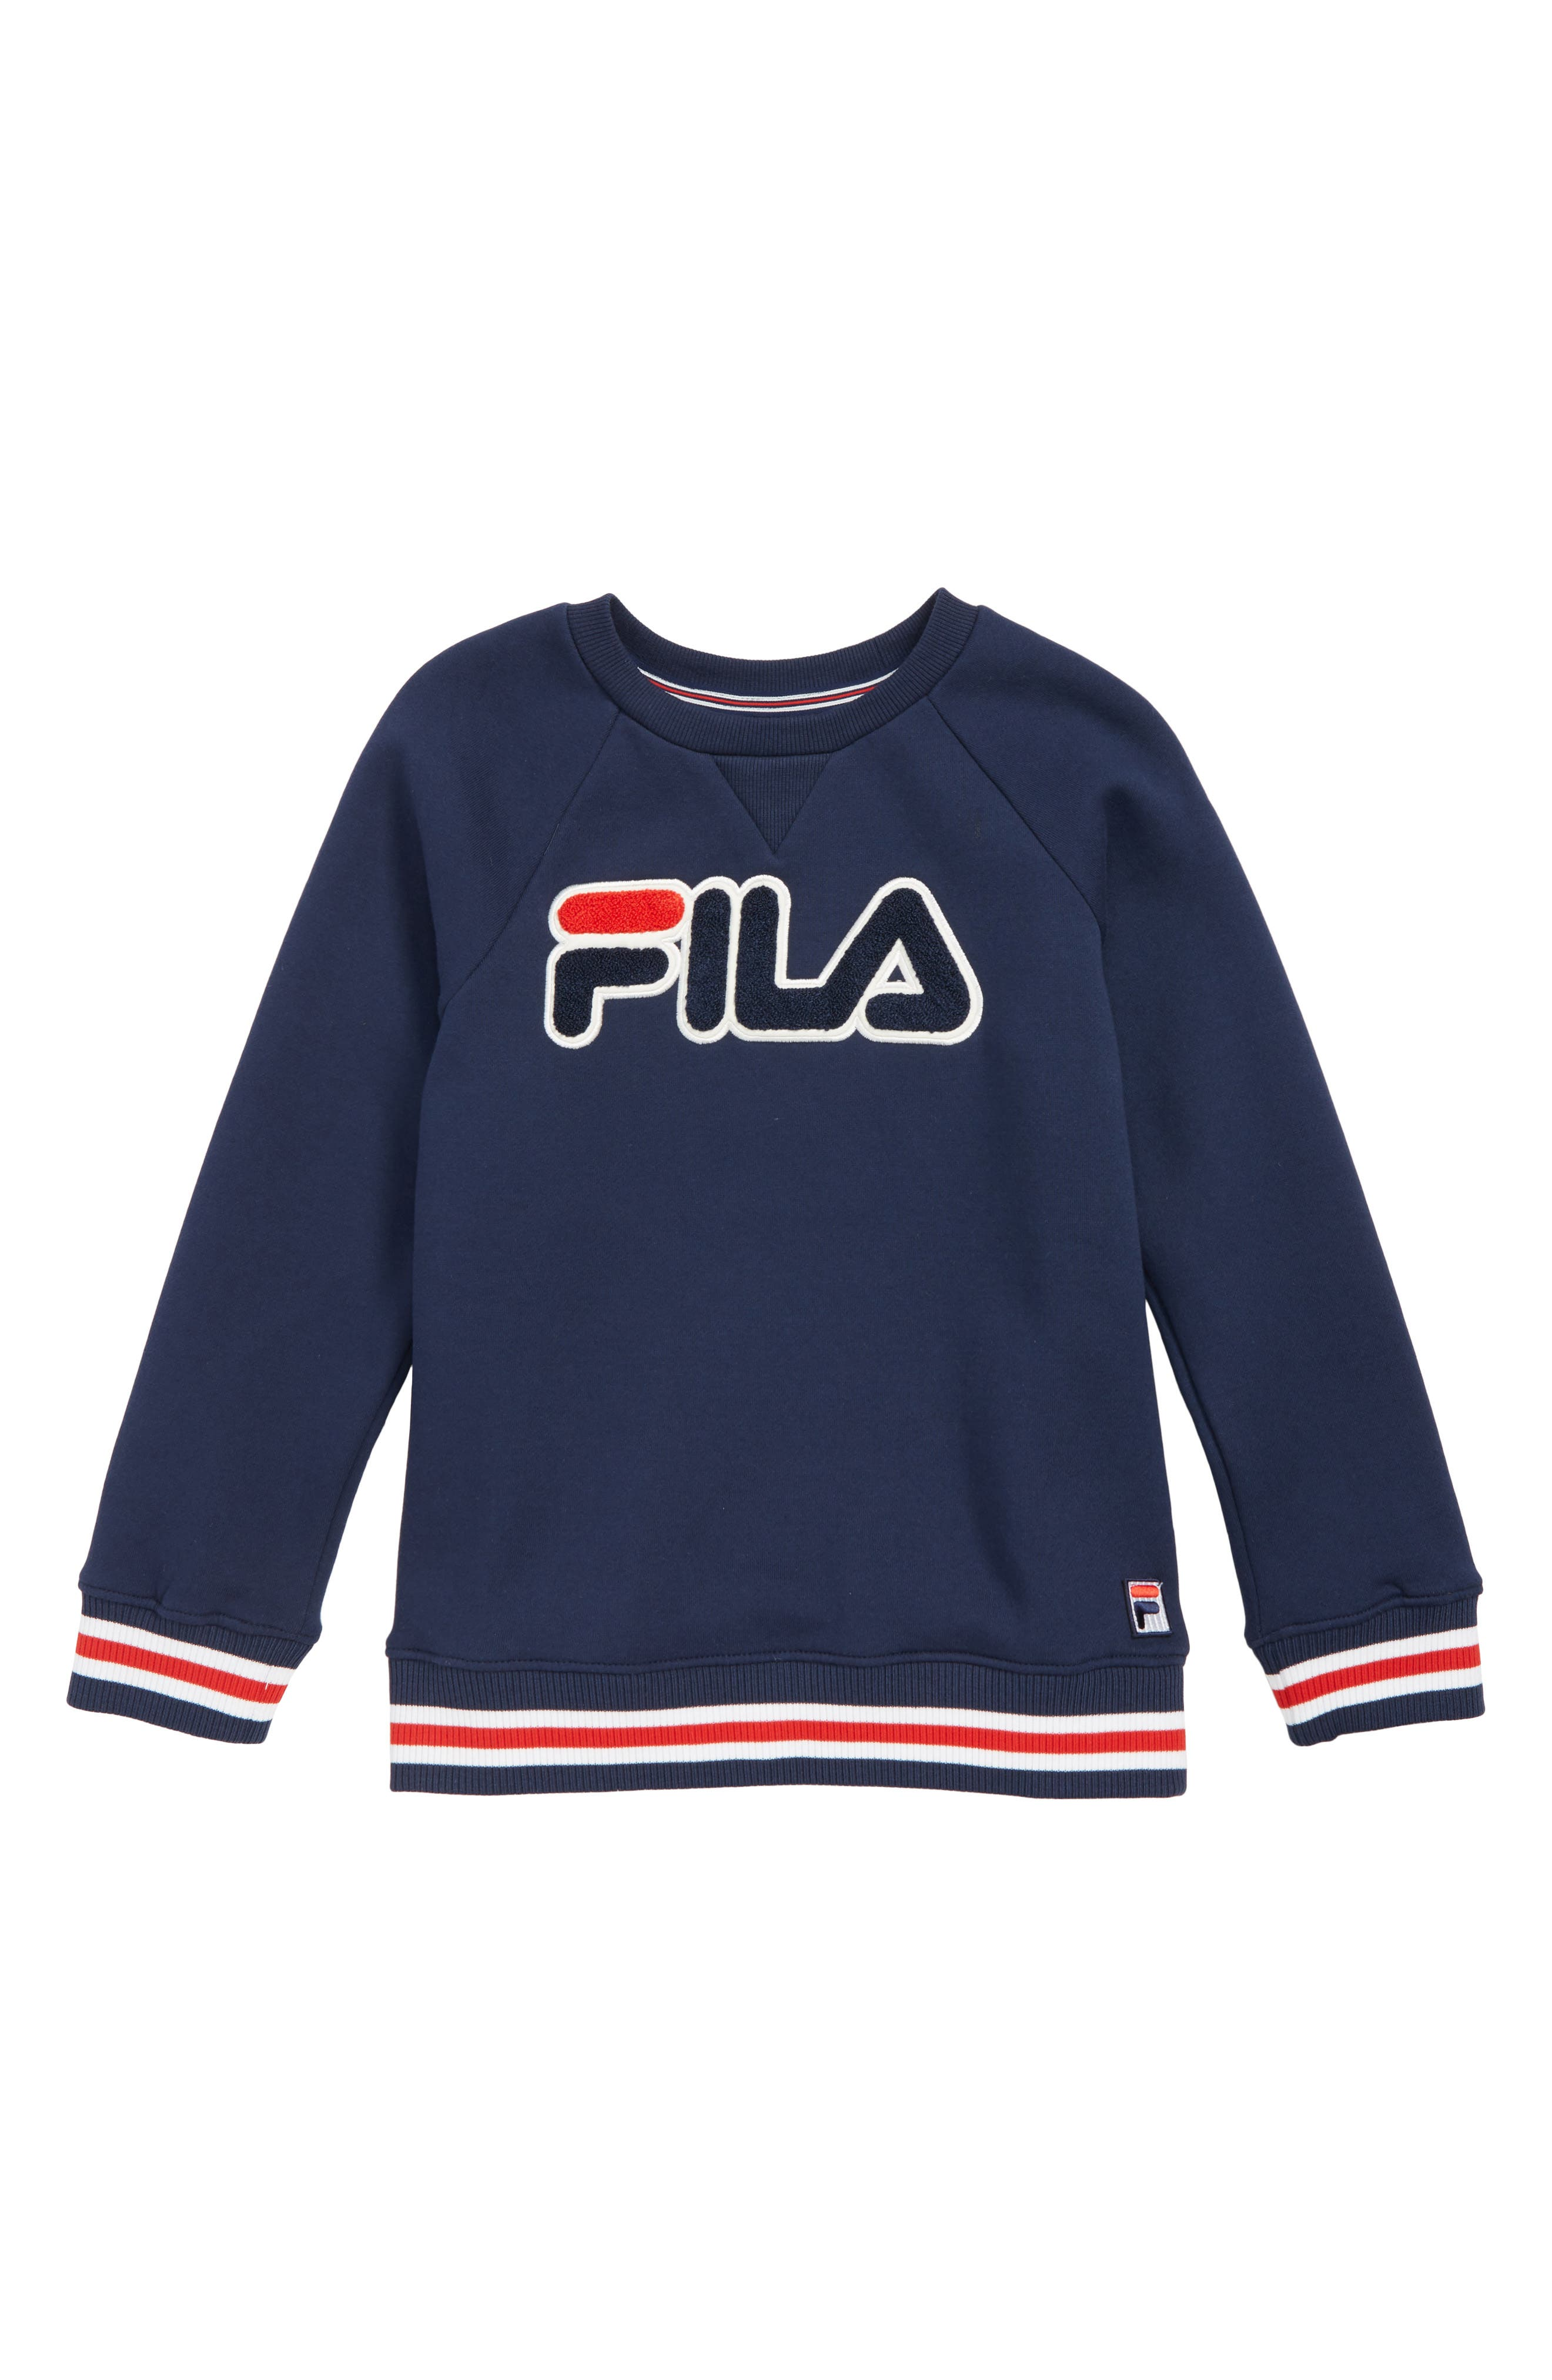 Boys Fila Varsity Crew Sweatshirt